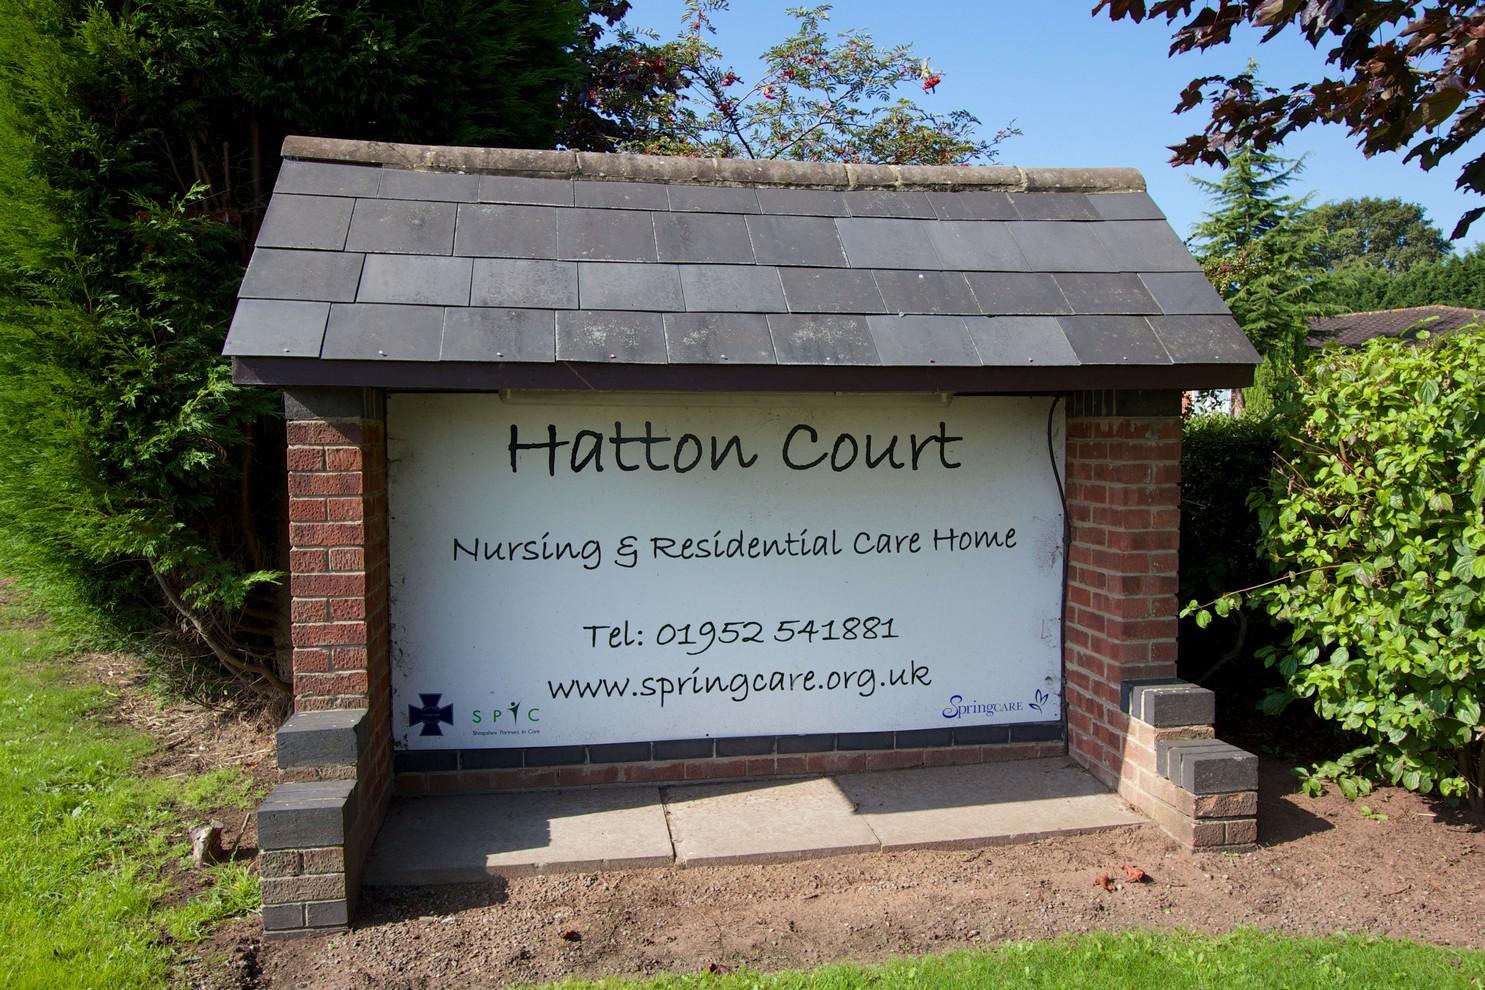 Hatton Court Care Home Shropshire